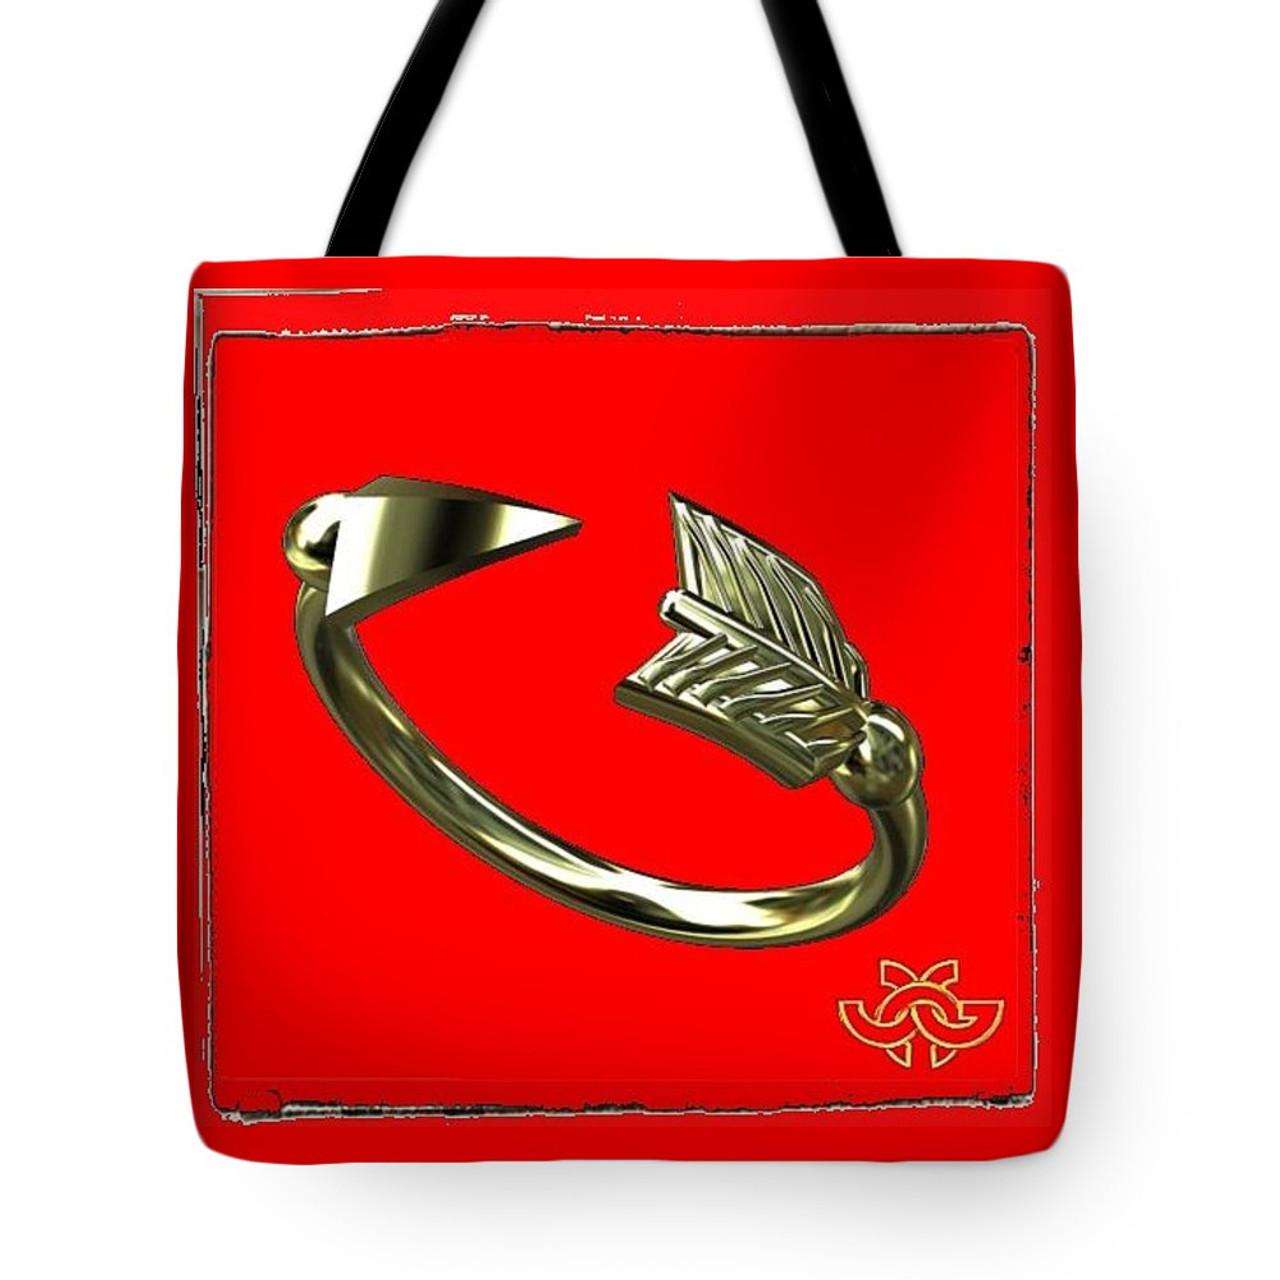 Arrow Rings. Art meets fashion in artful tote bags